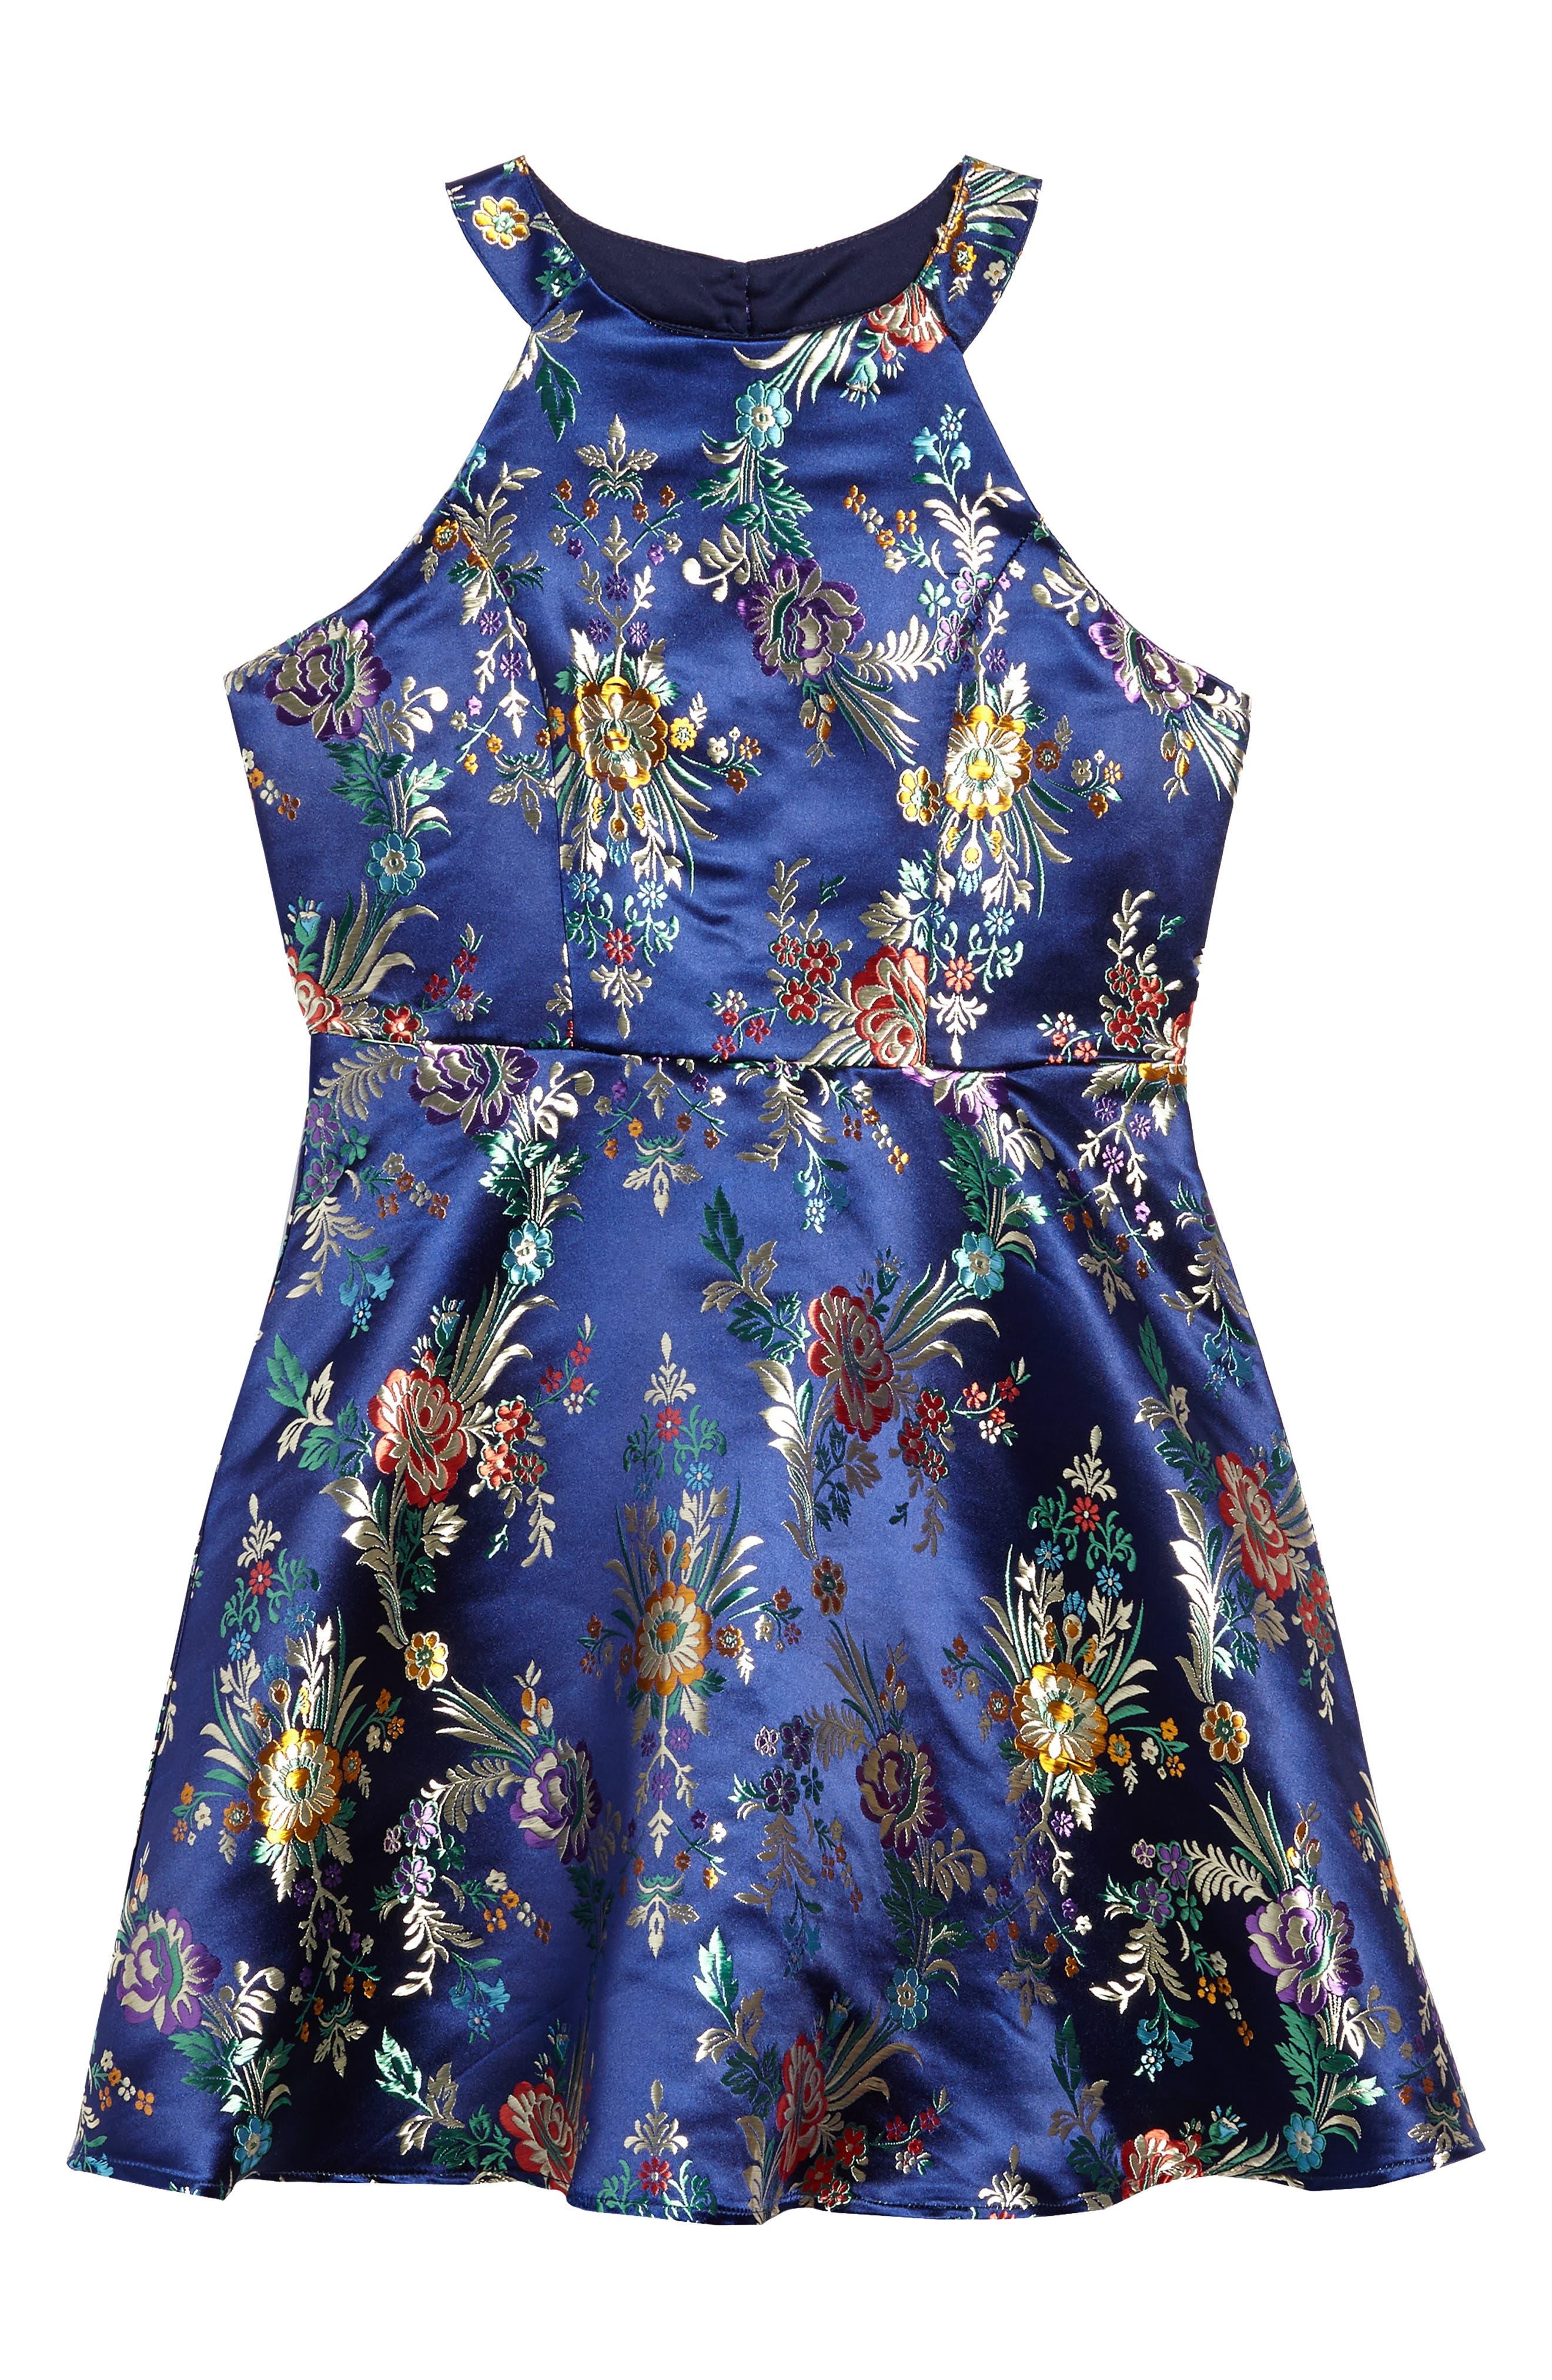 Main Image - Trixxi Metallic Floral Jacquard Dress (Big Girls)